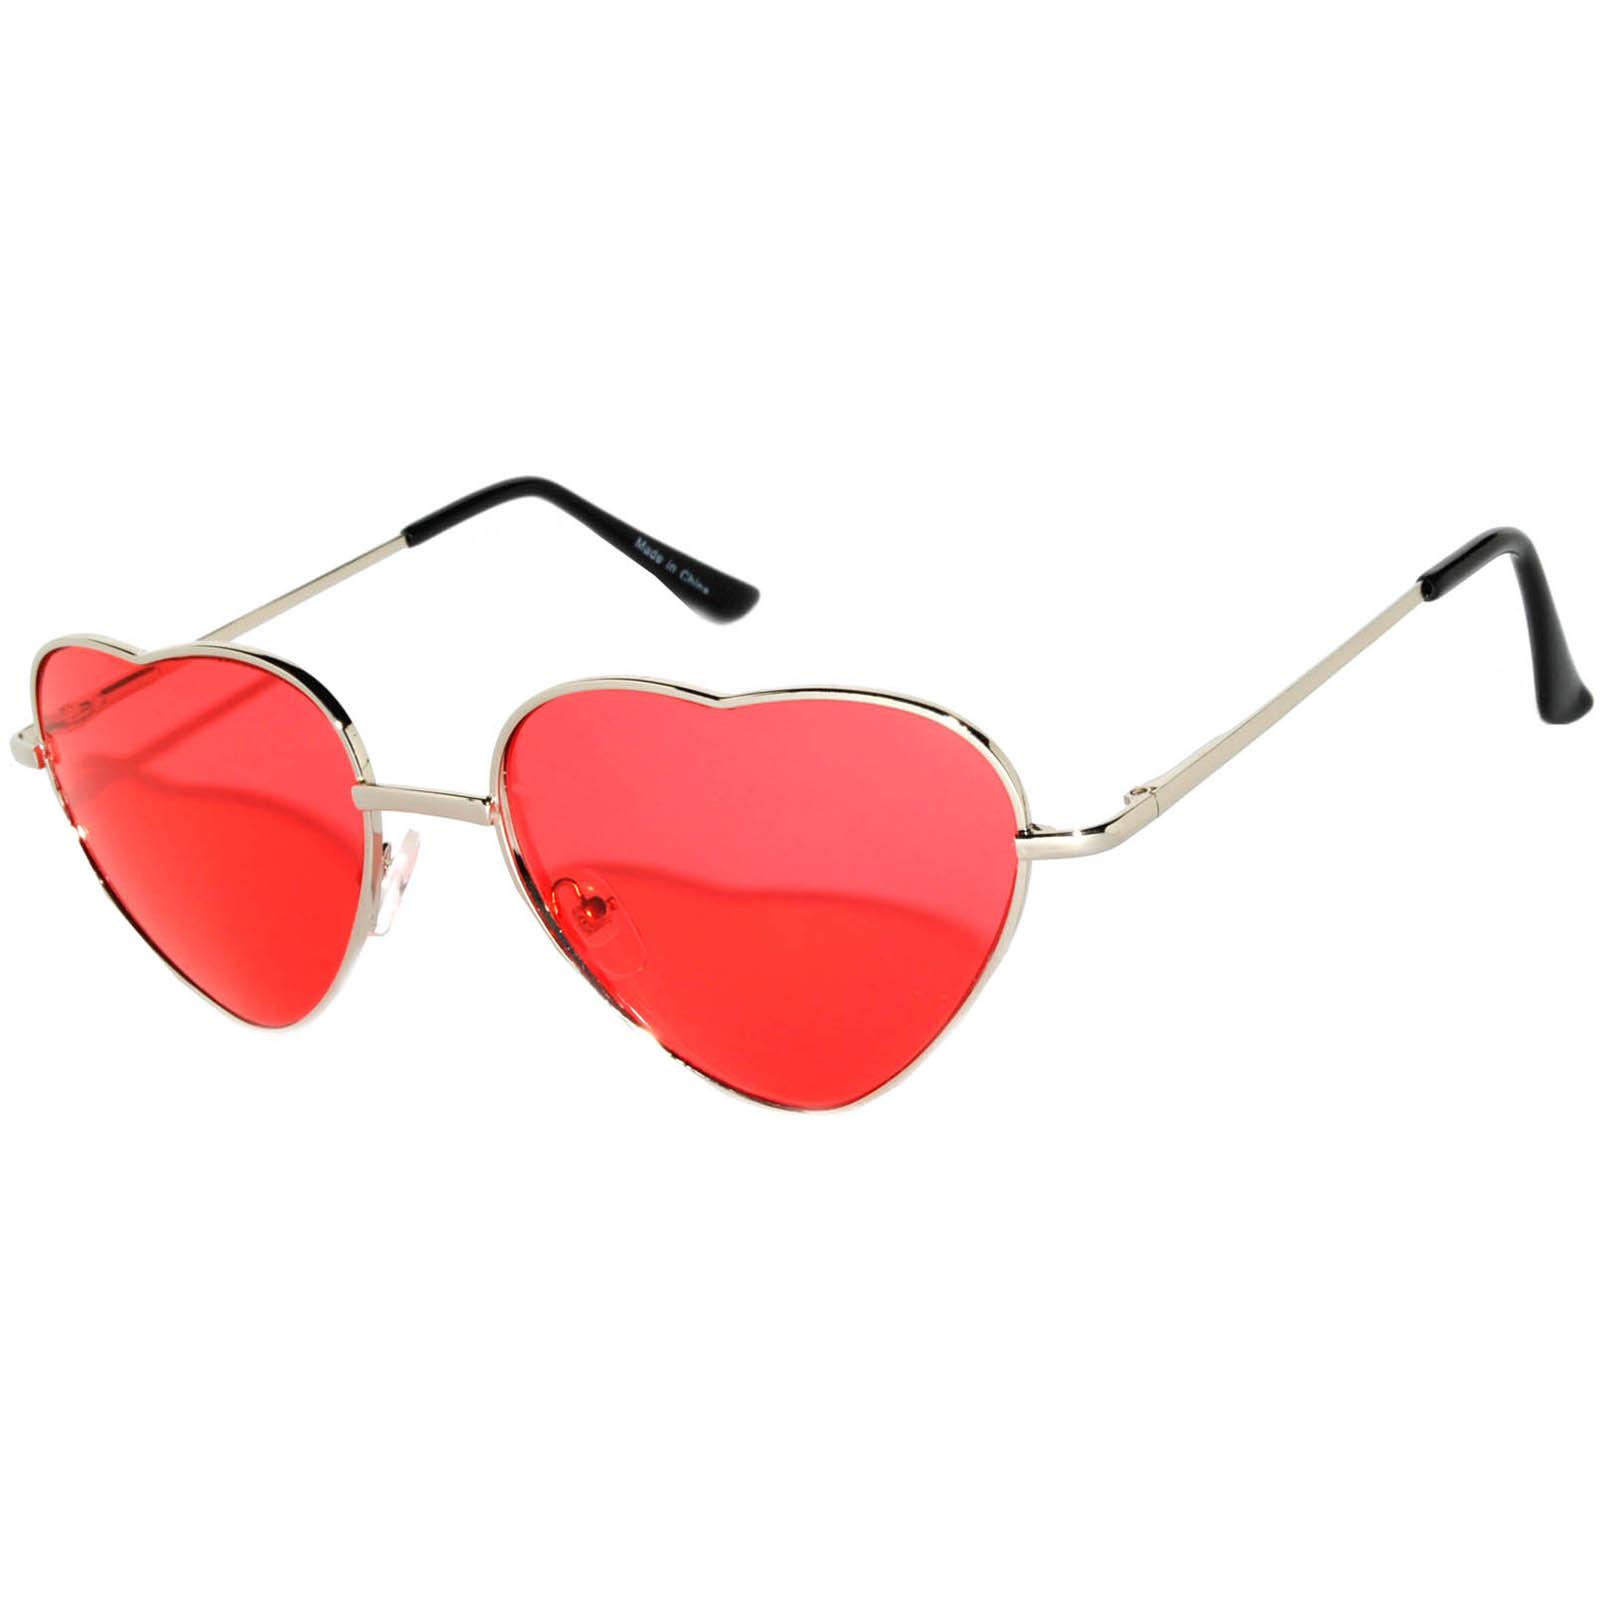 OWL ® Eyewear Sunglasses Heart Women\'s Metal Silver Frame Red Lens ...